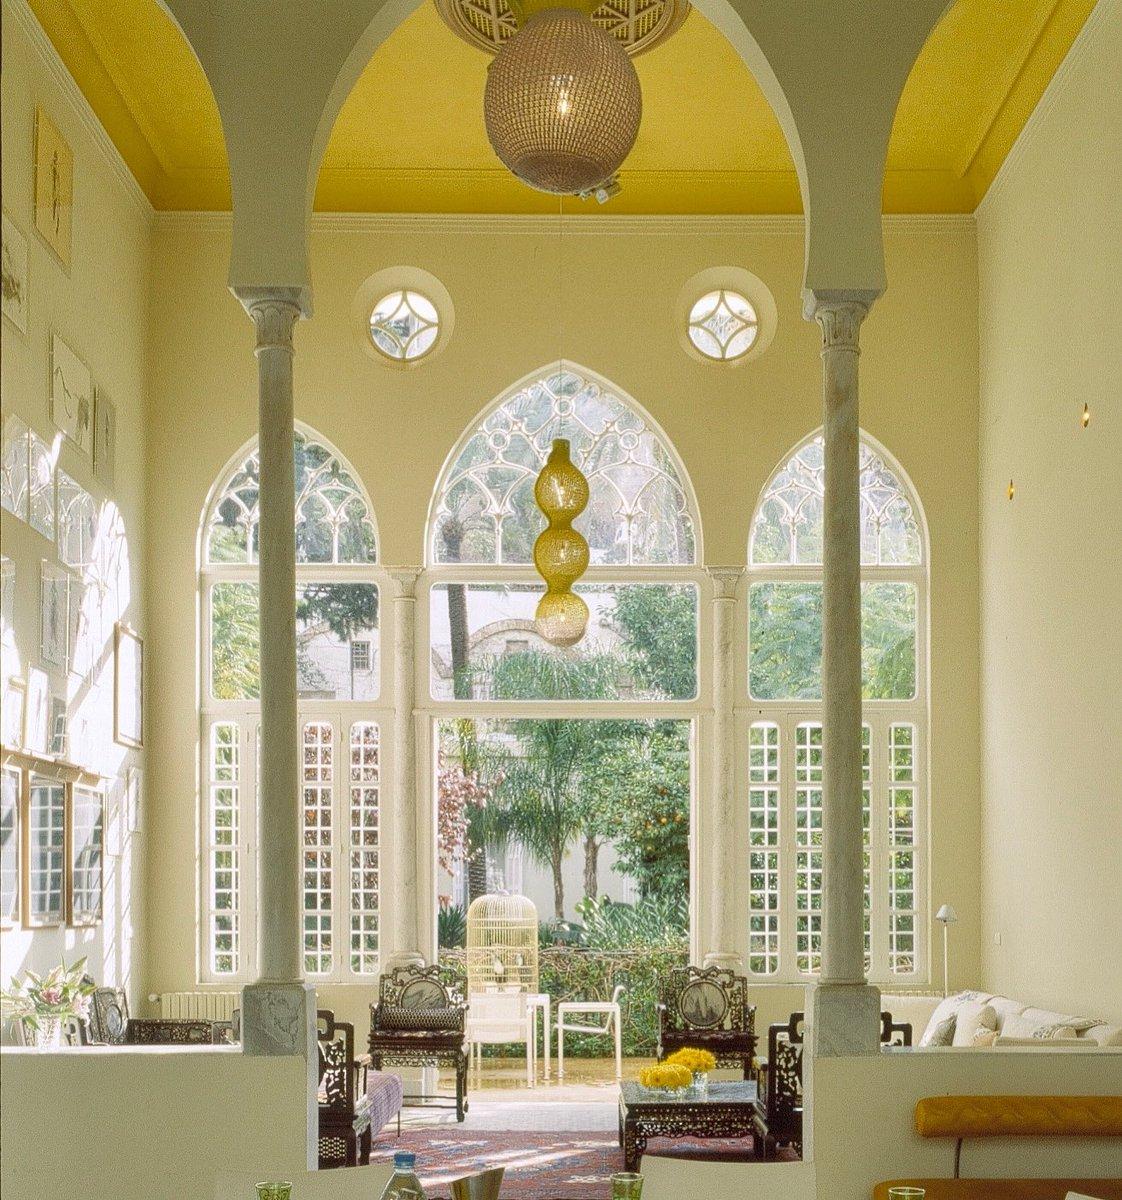 Triple-sphere ceiling 'Stocking' light by @cai_light • #cailight #cailighting #lighting #lightingdesign #design #brightroom #beirutting #design #lamps #designerlamp #architecturallighting #designinspo #interiordesign #instadecor pic.twitter.com/Z2SdoMVvgF